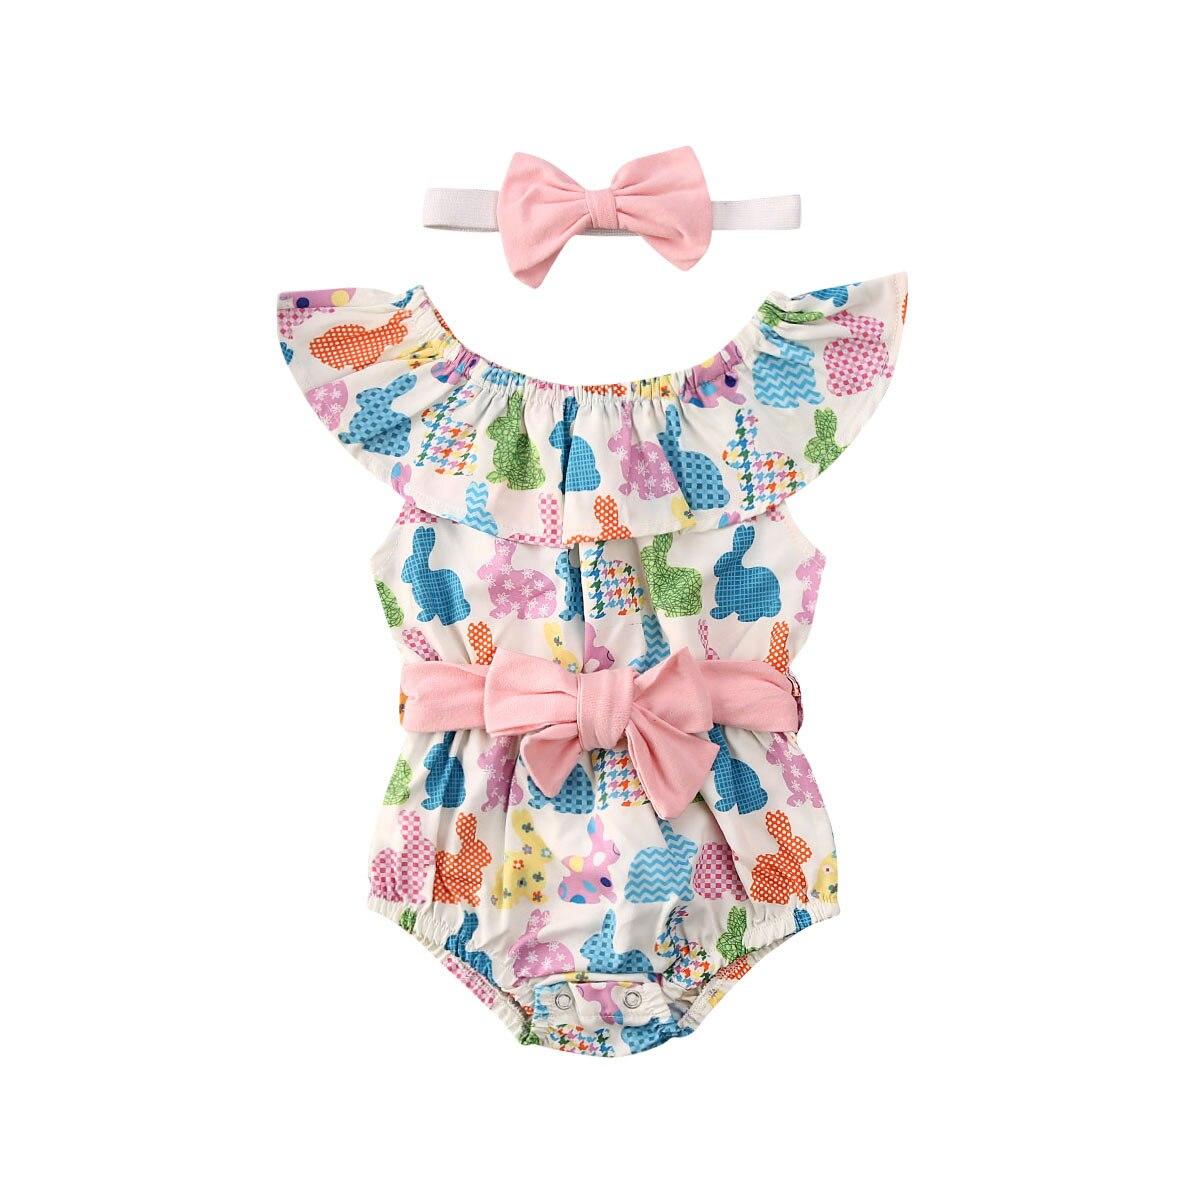 0-24M Easter Infant Kids Baby Girls Bodysuits Rabbit Print Ruffles Sleeve Elastic Waist Bowknot Cute Jumpsuits+Headband 2pcs